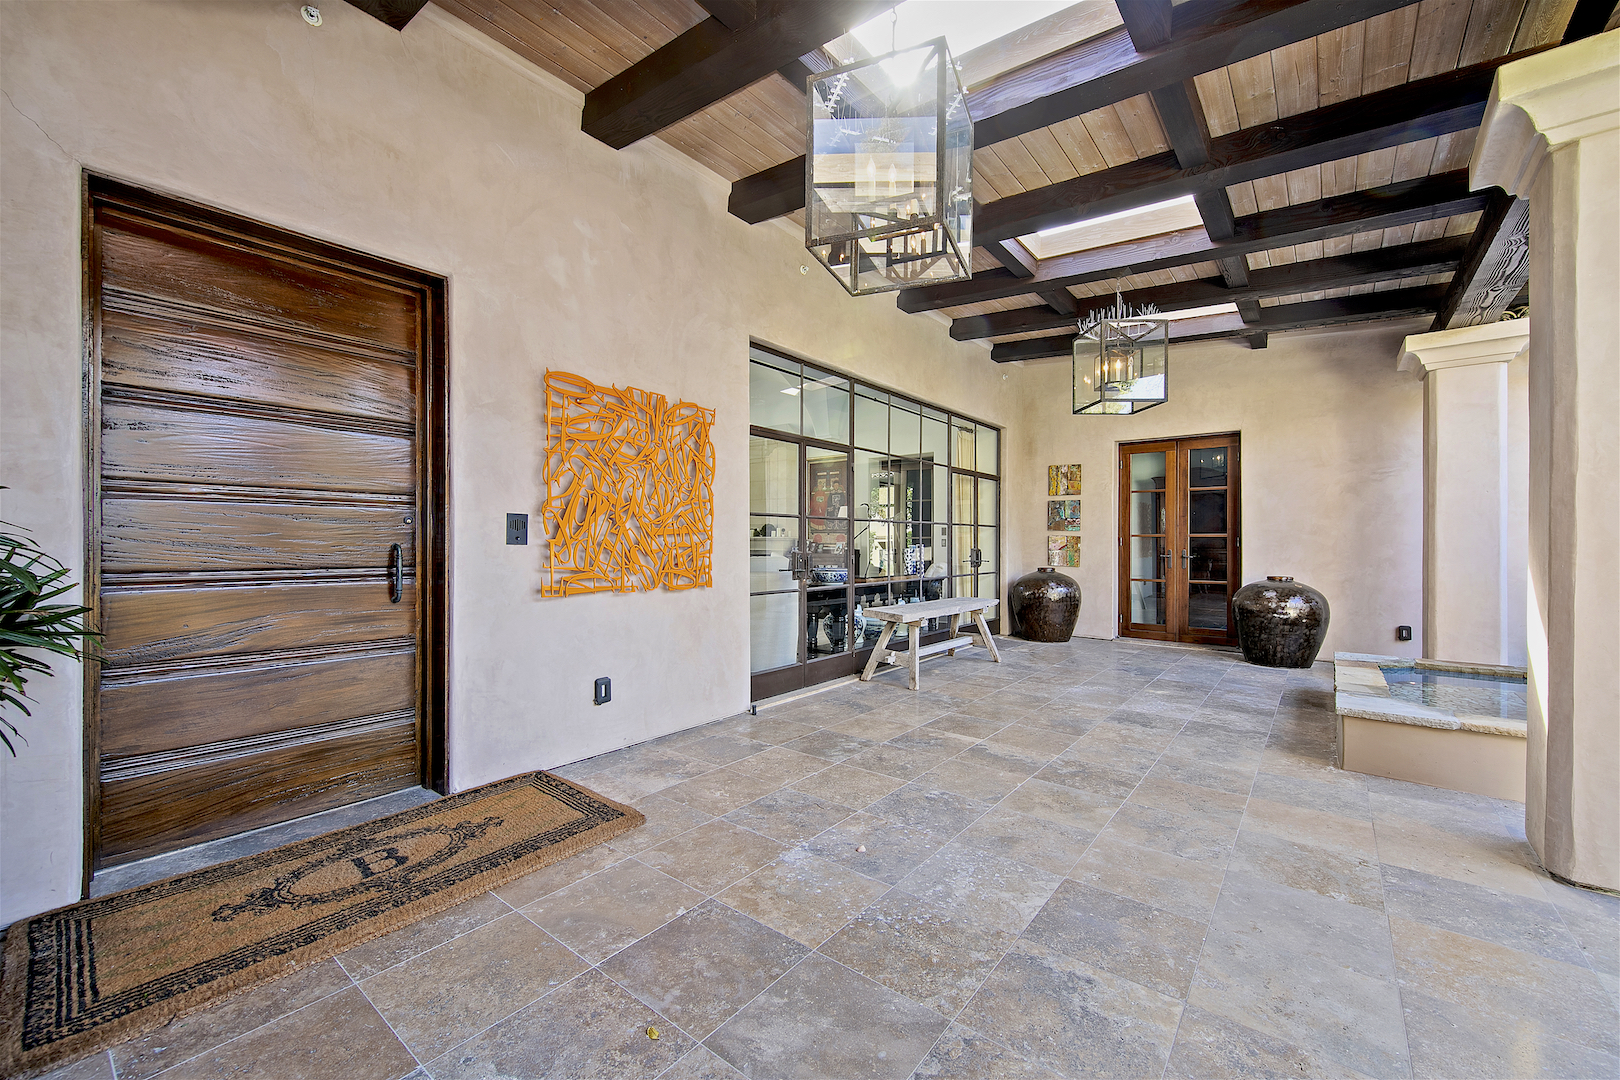 6221 Mimulus -  Rancho Santa Fe, CA 92067